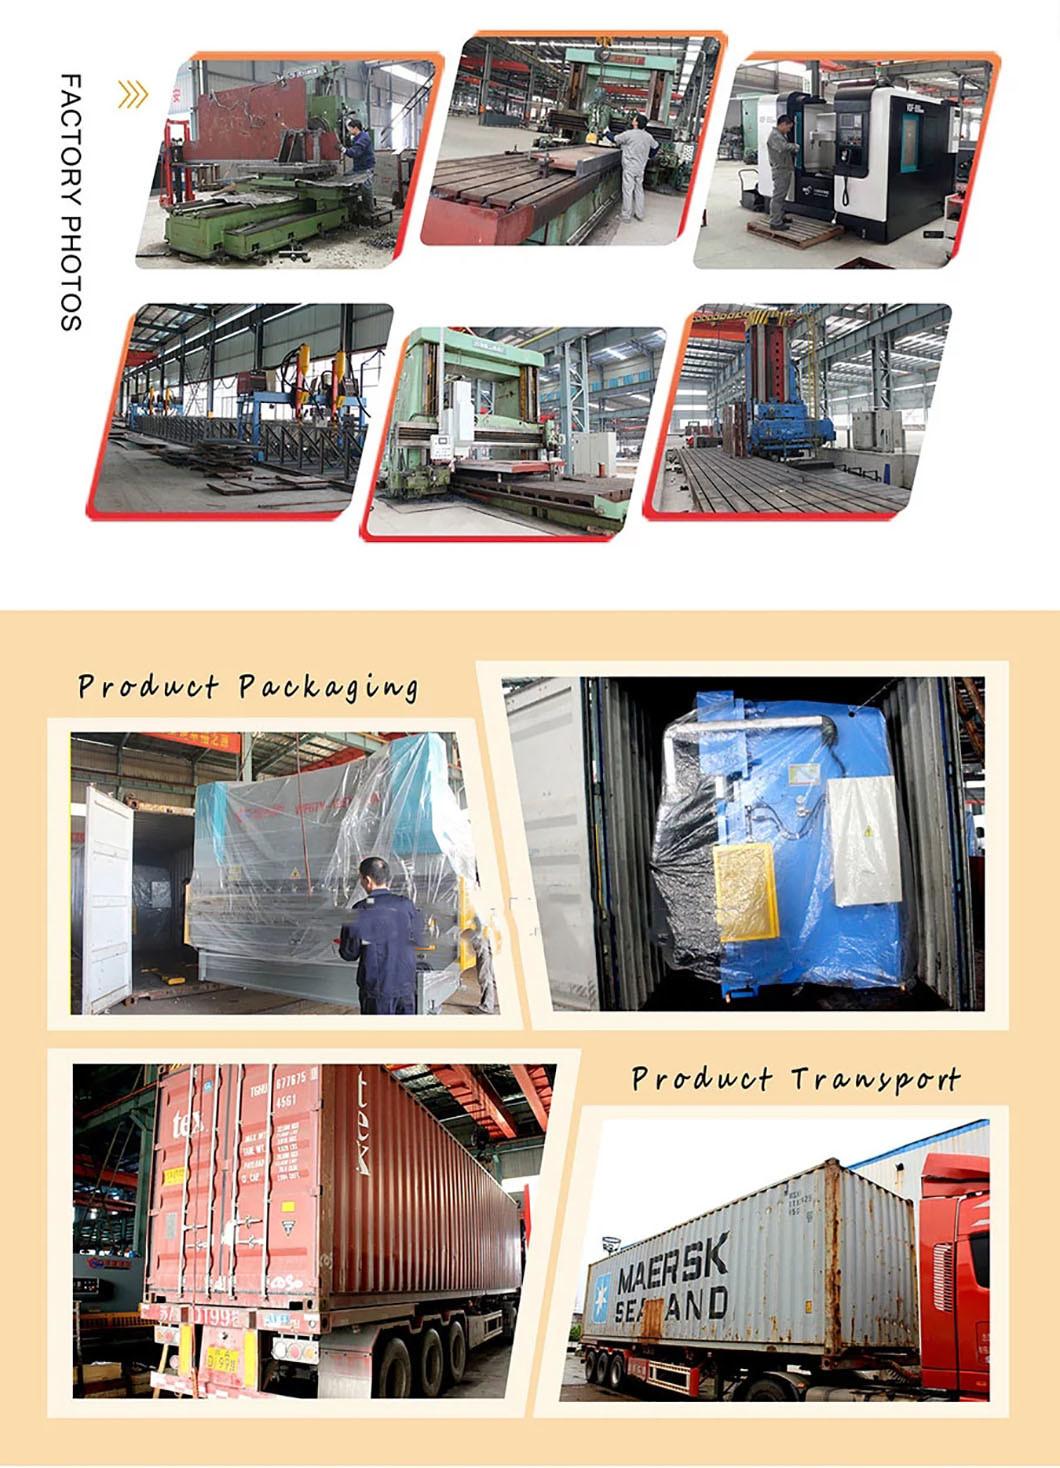 100t Fiberglass Reinforced Plastics Product Hydraulic Press for Composite Materials Molding